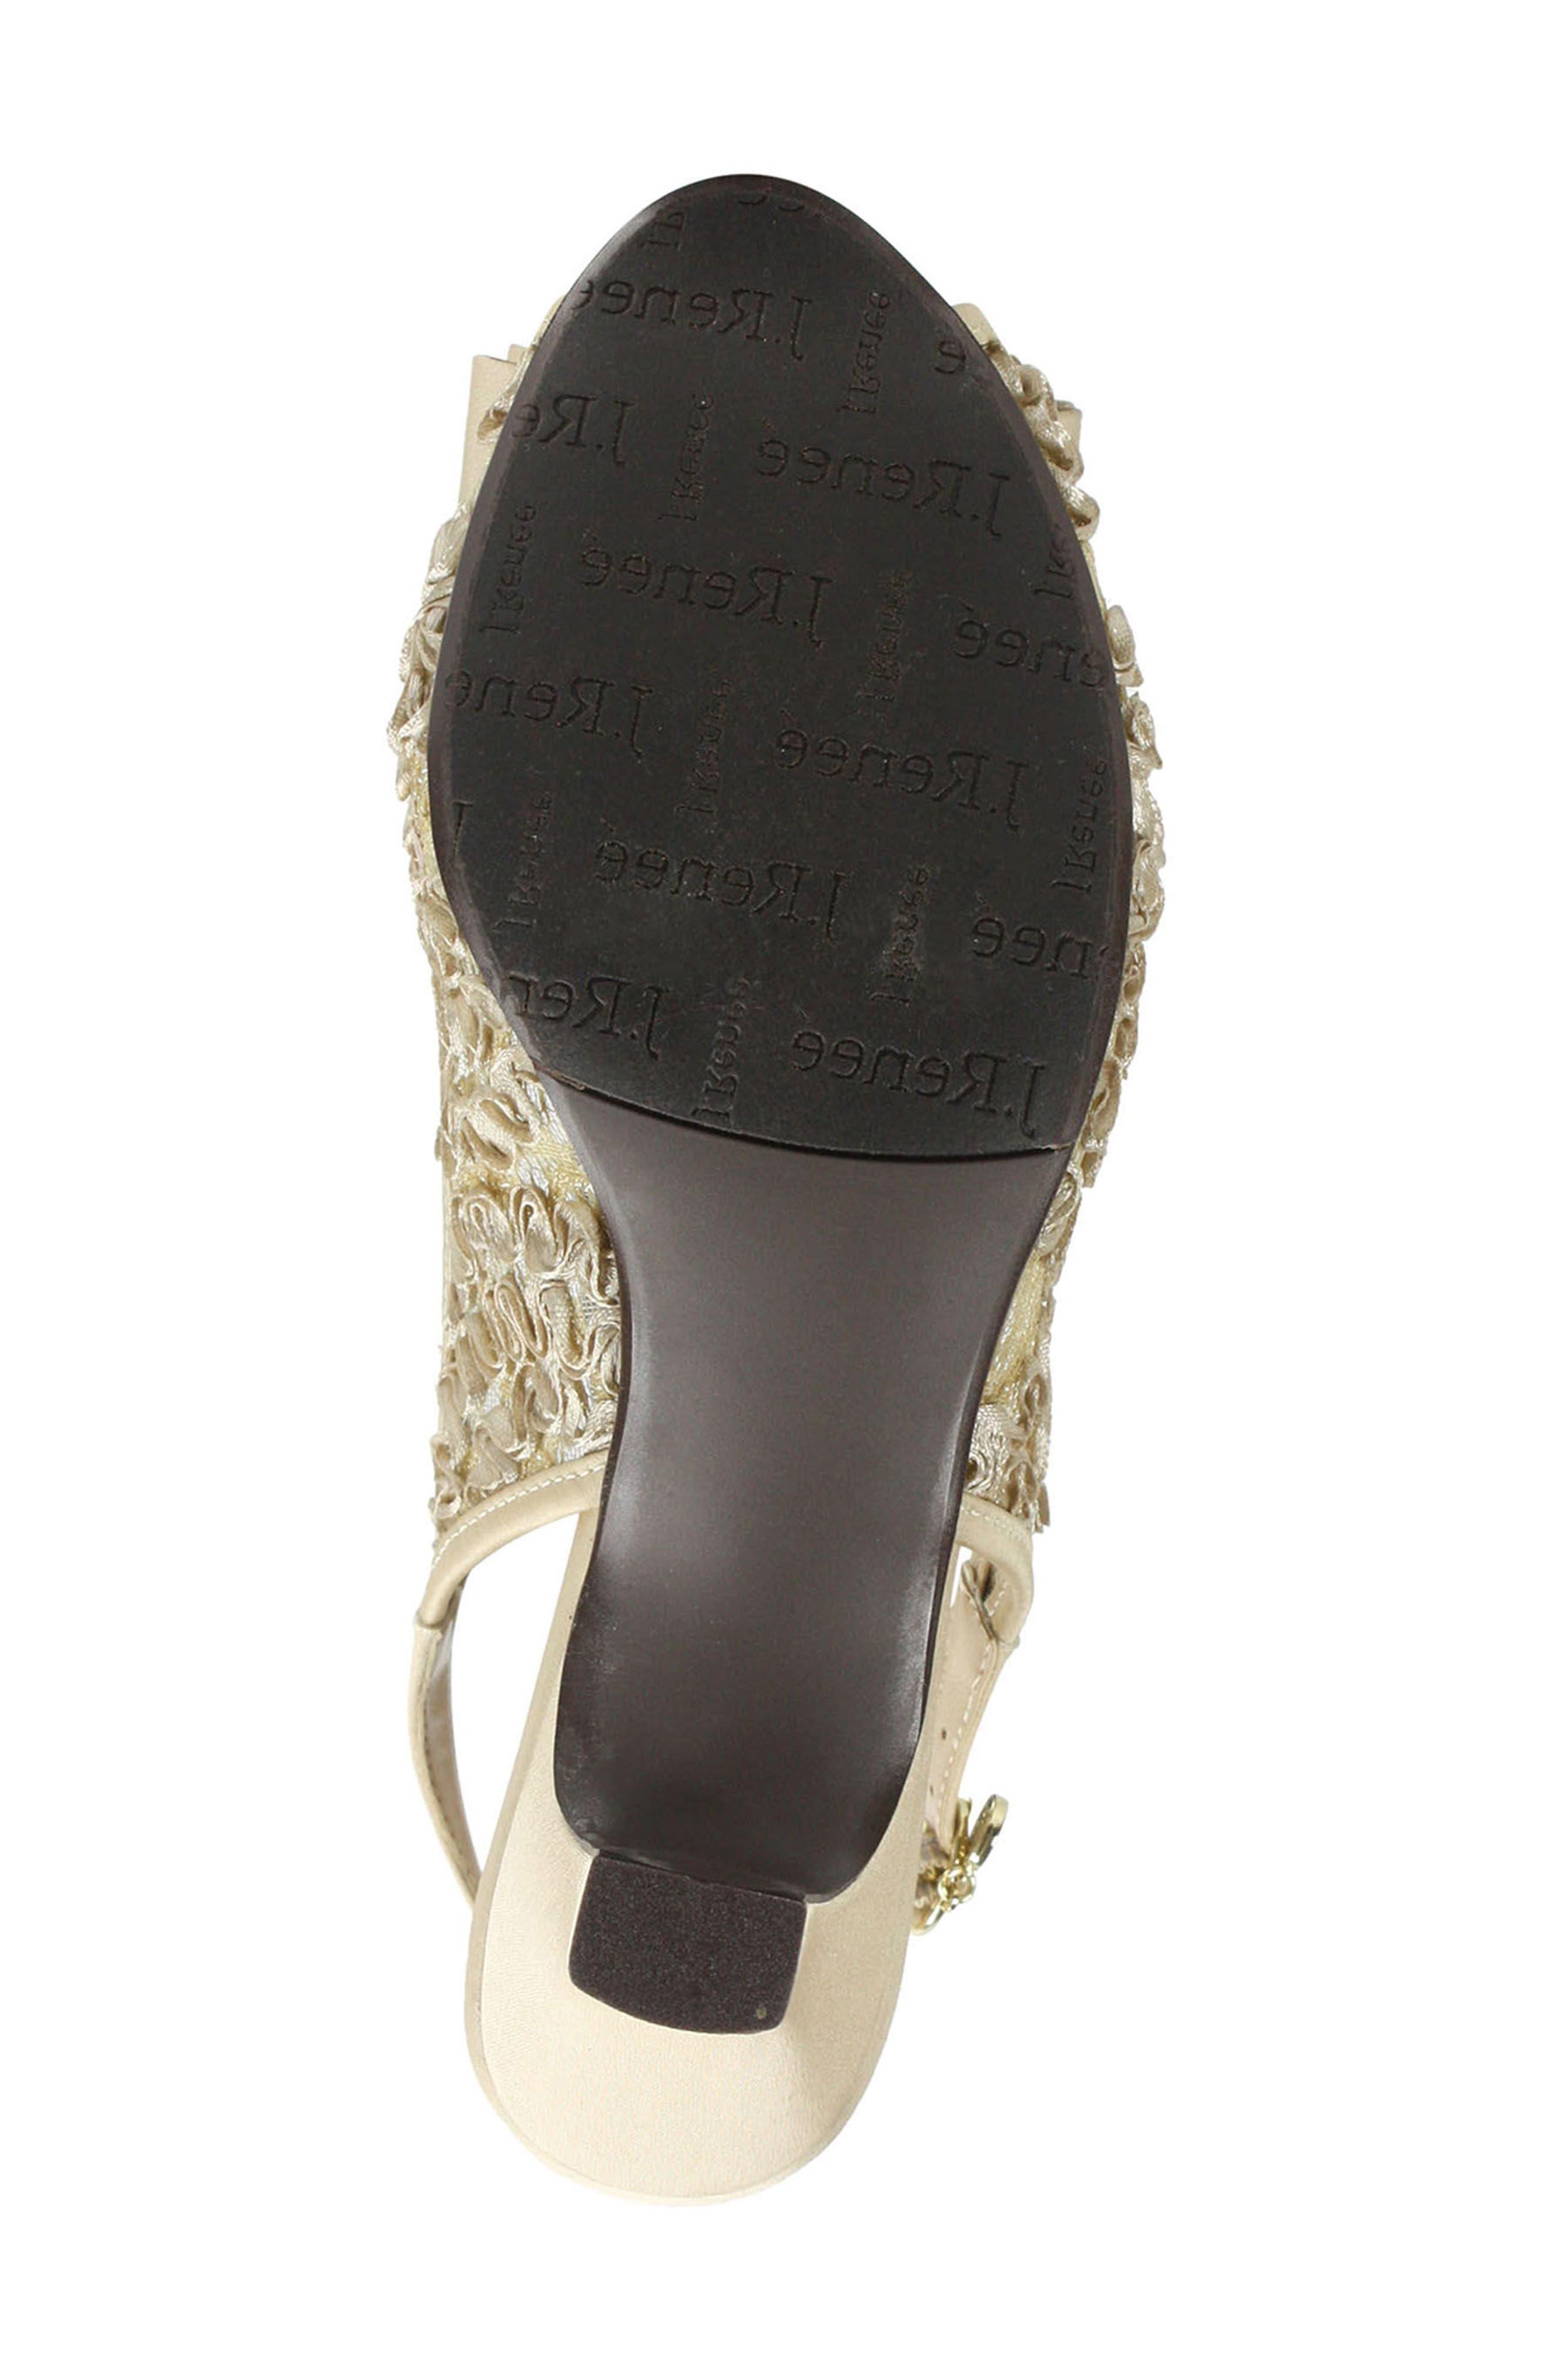 Landan Bow Slingback Sandal,                             Alternate thumbnail 5, color,                             Champagne